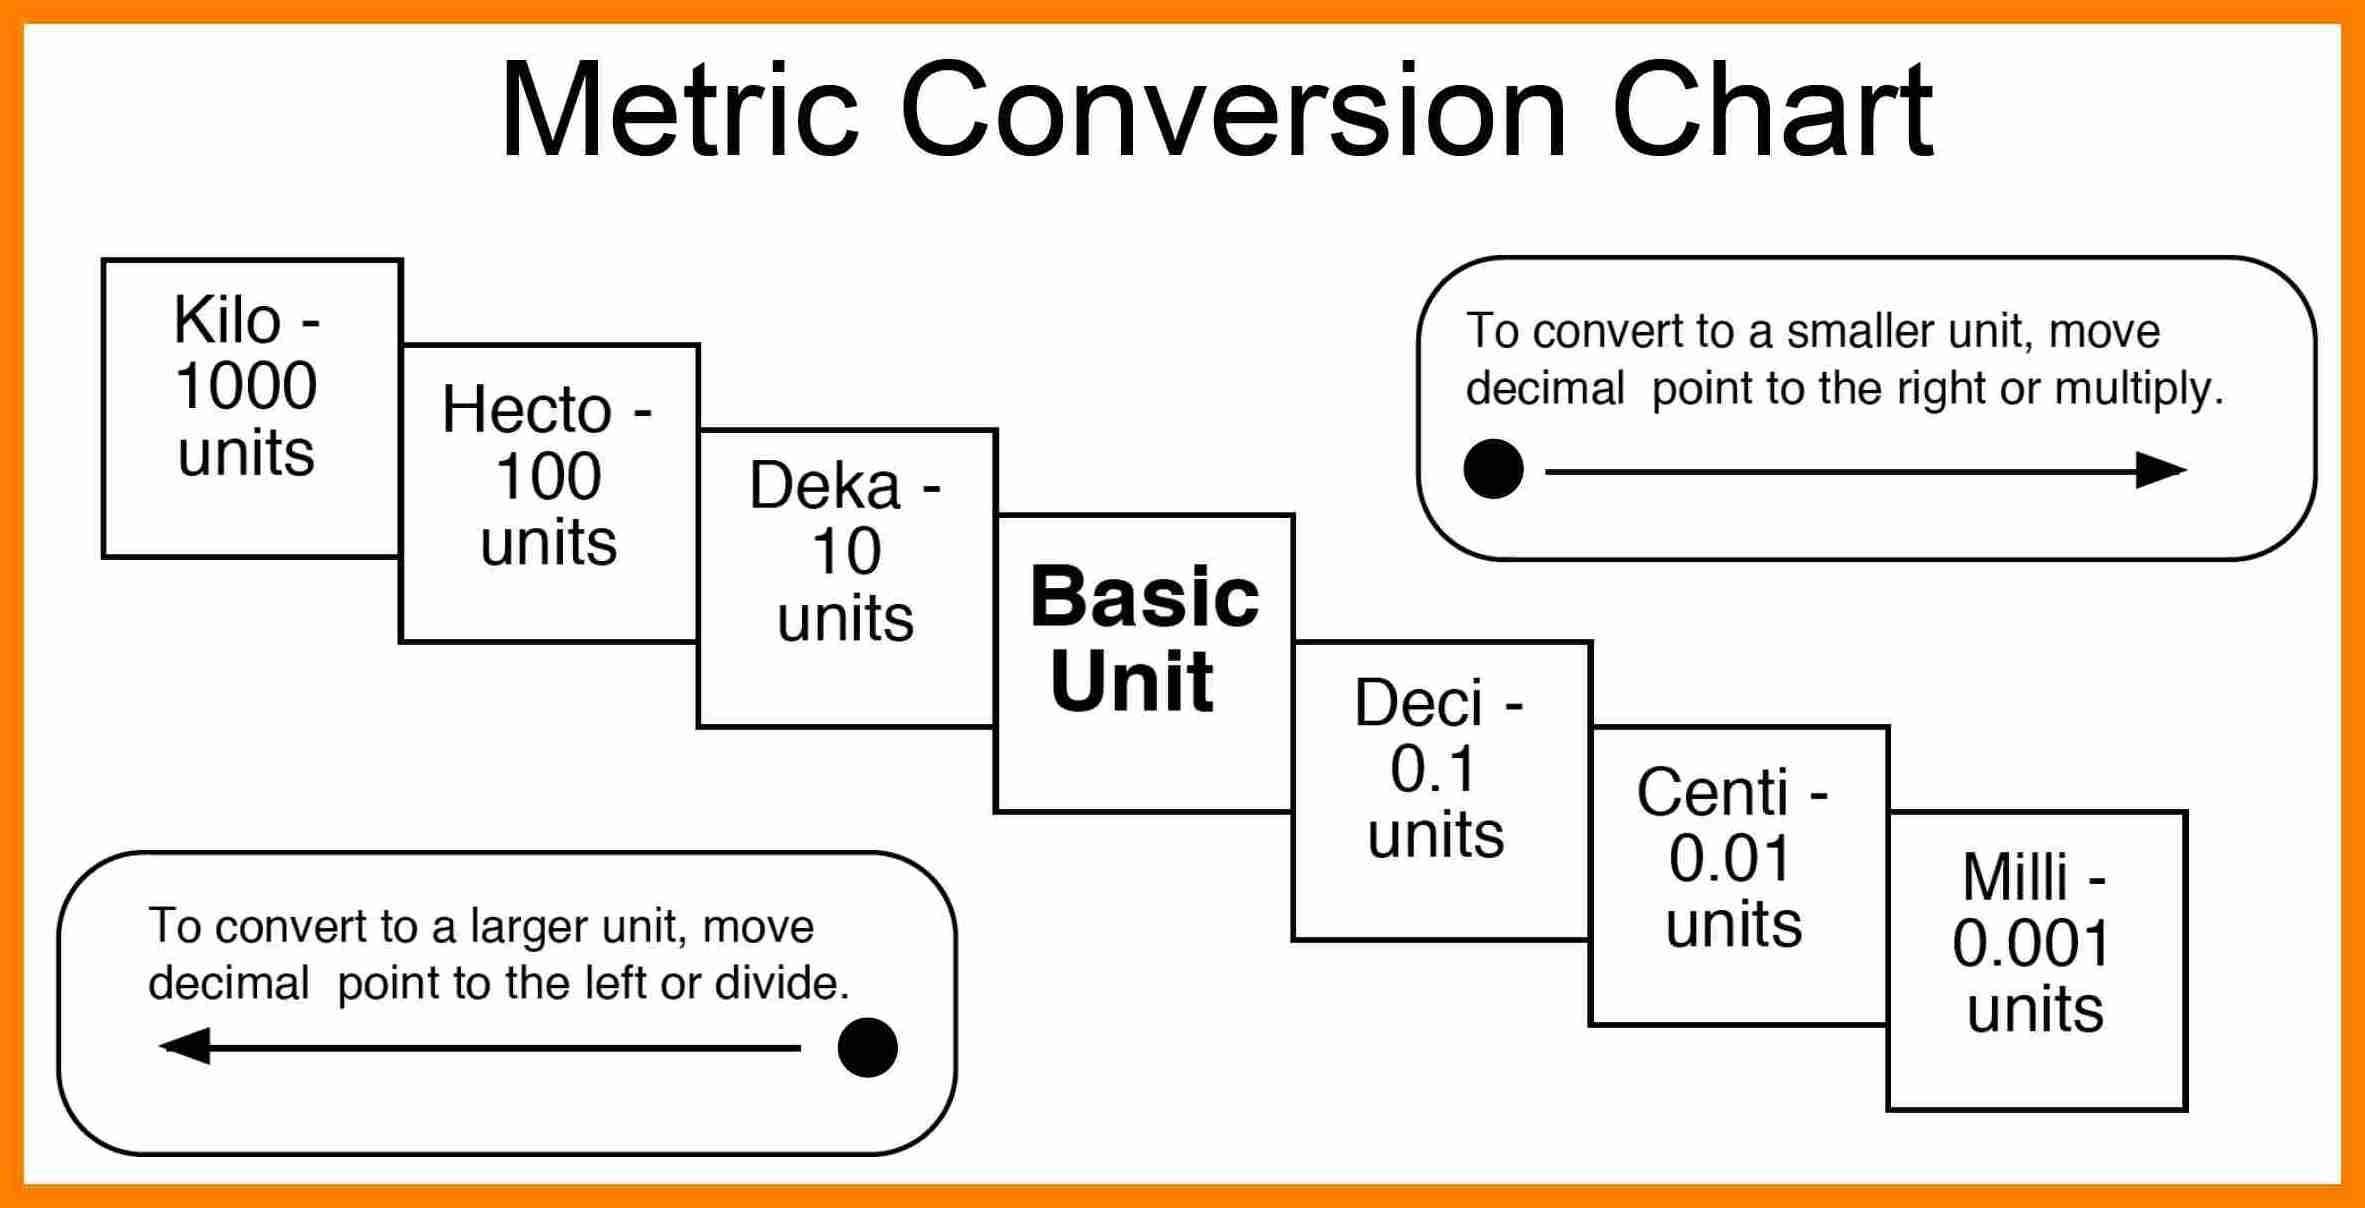 http://newhopestreamwood.com/4-metric-system-chart/